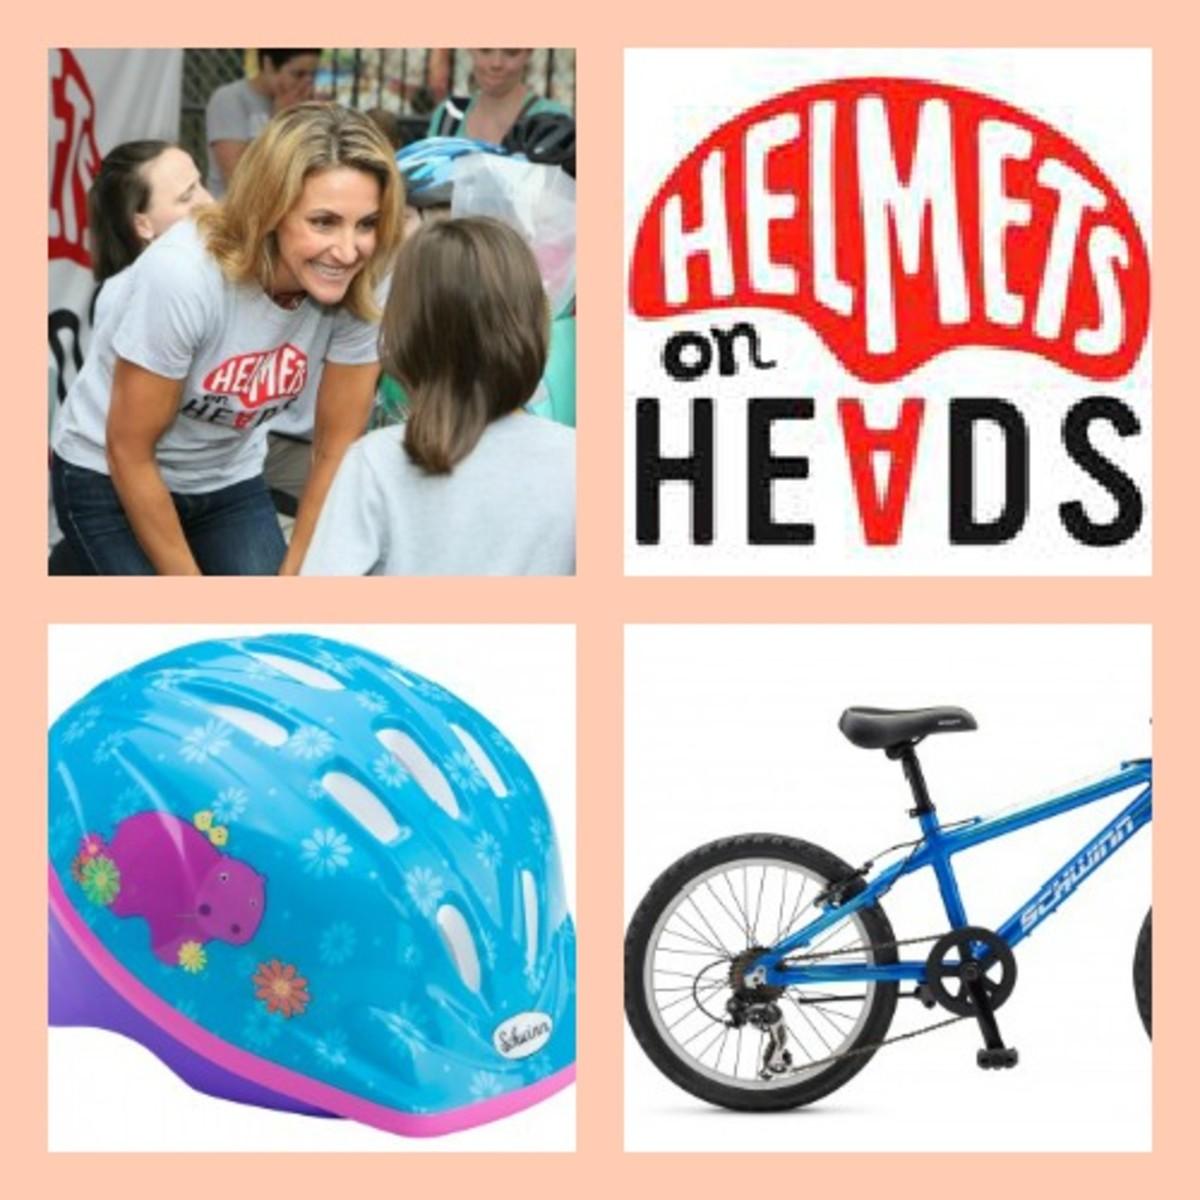 helmetsonheads